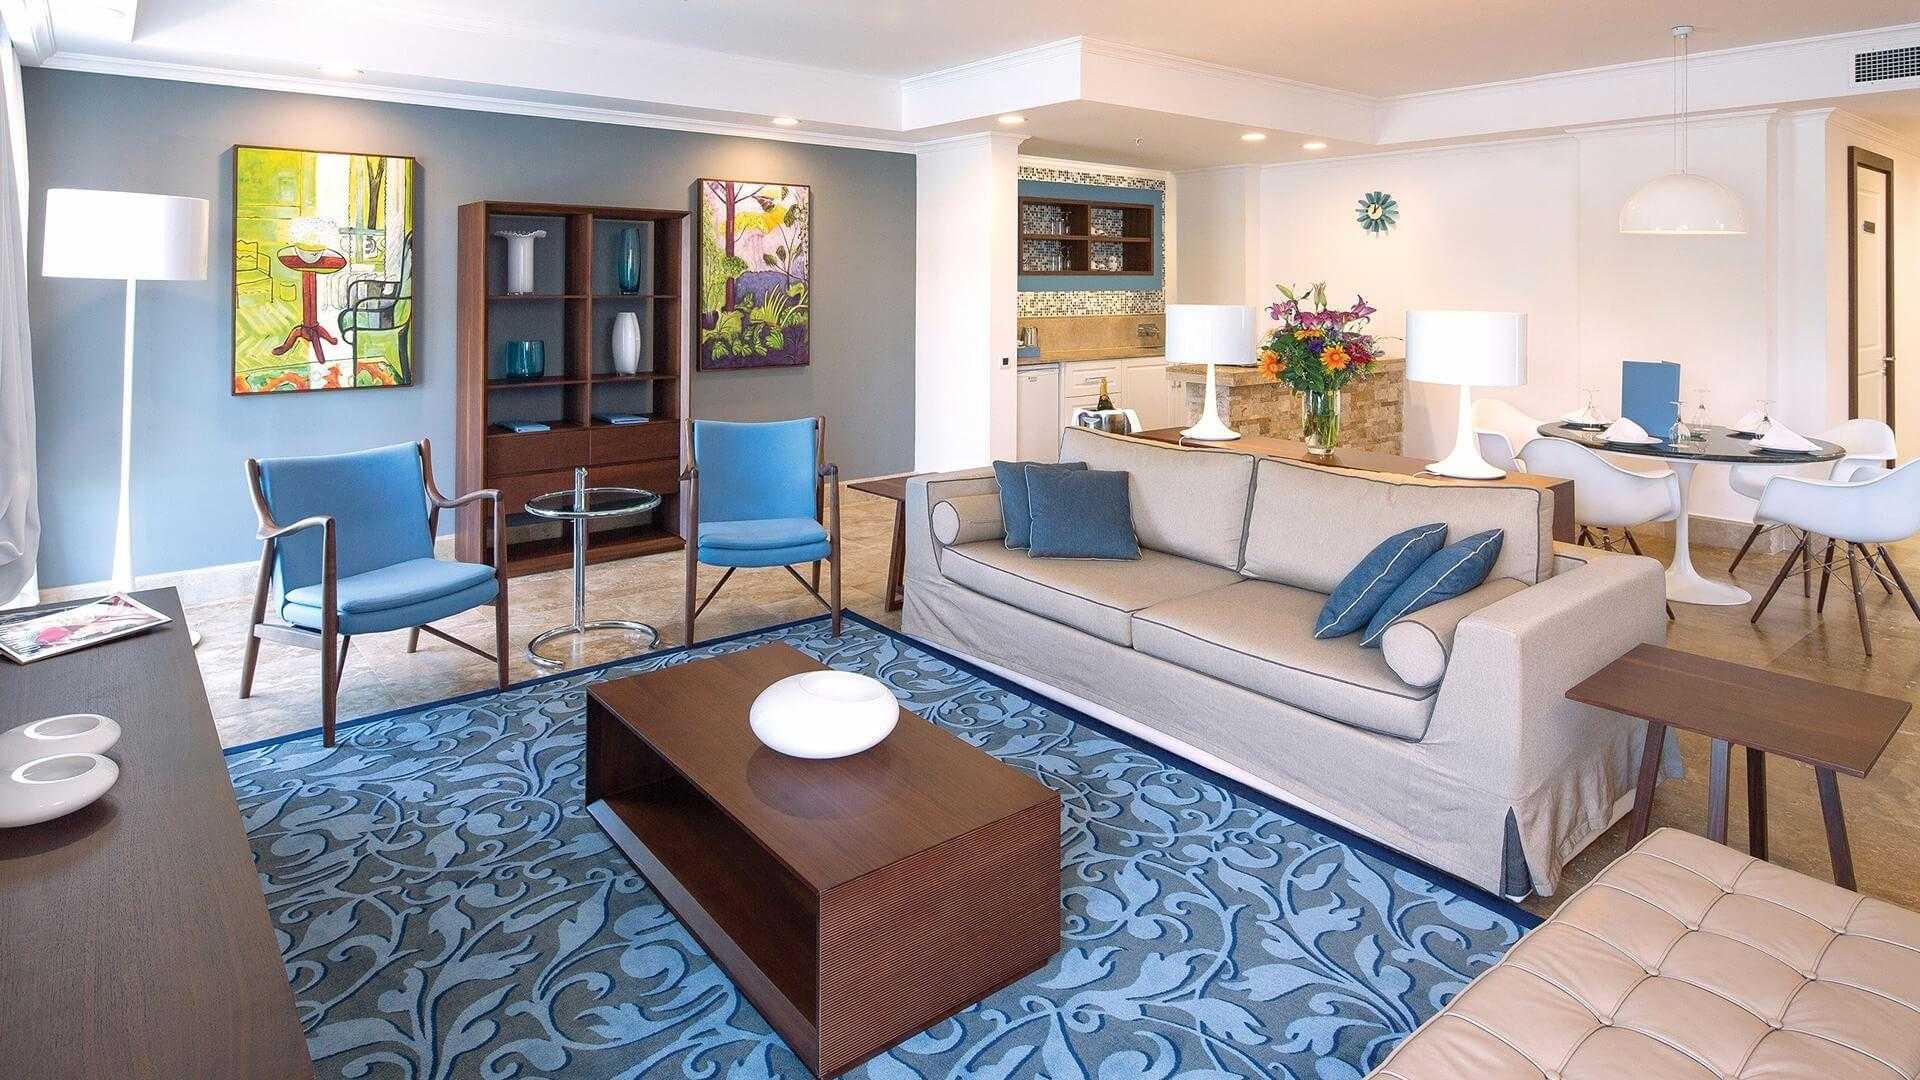 Azure Villa by Cornelia 3 bedroom скидка на раннее бронирование 2020